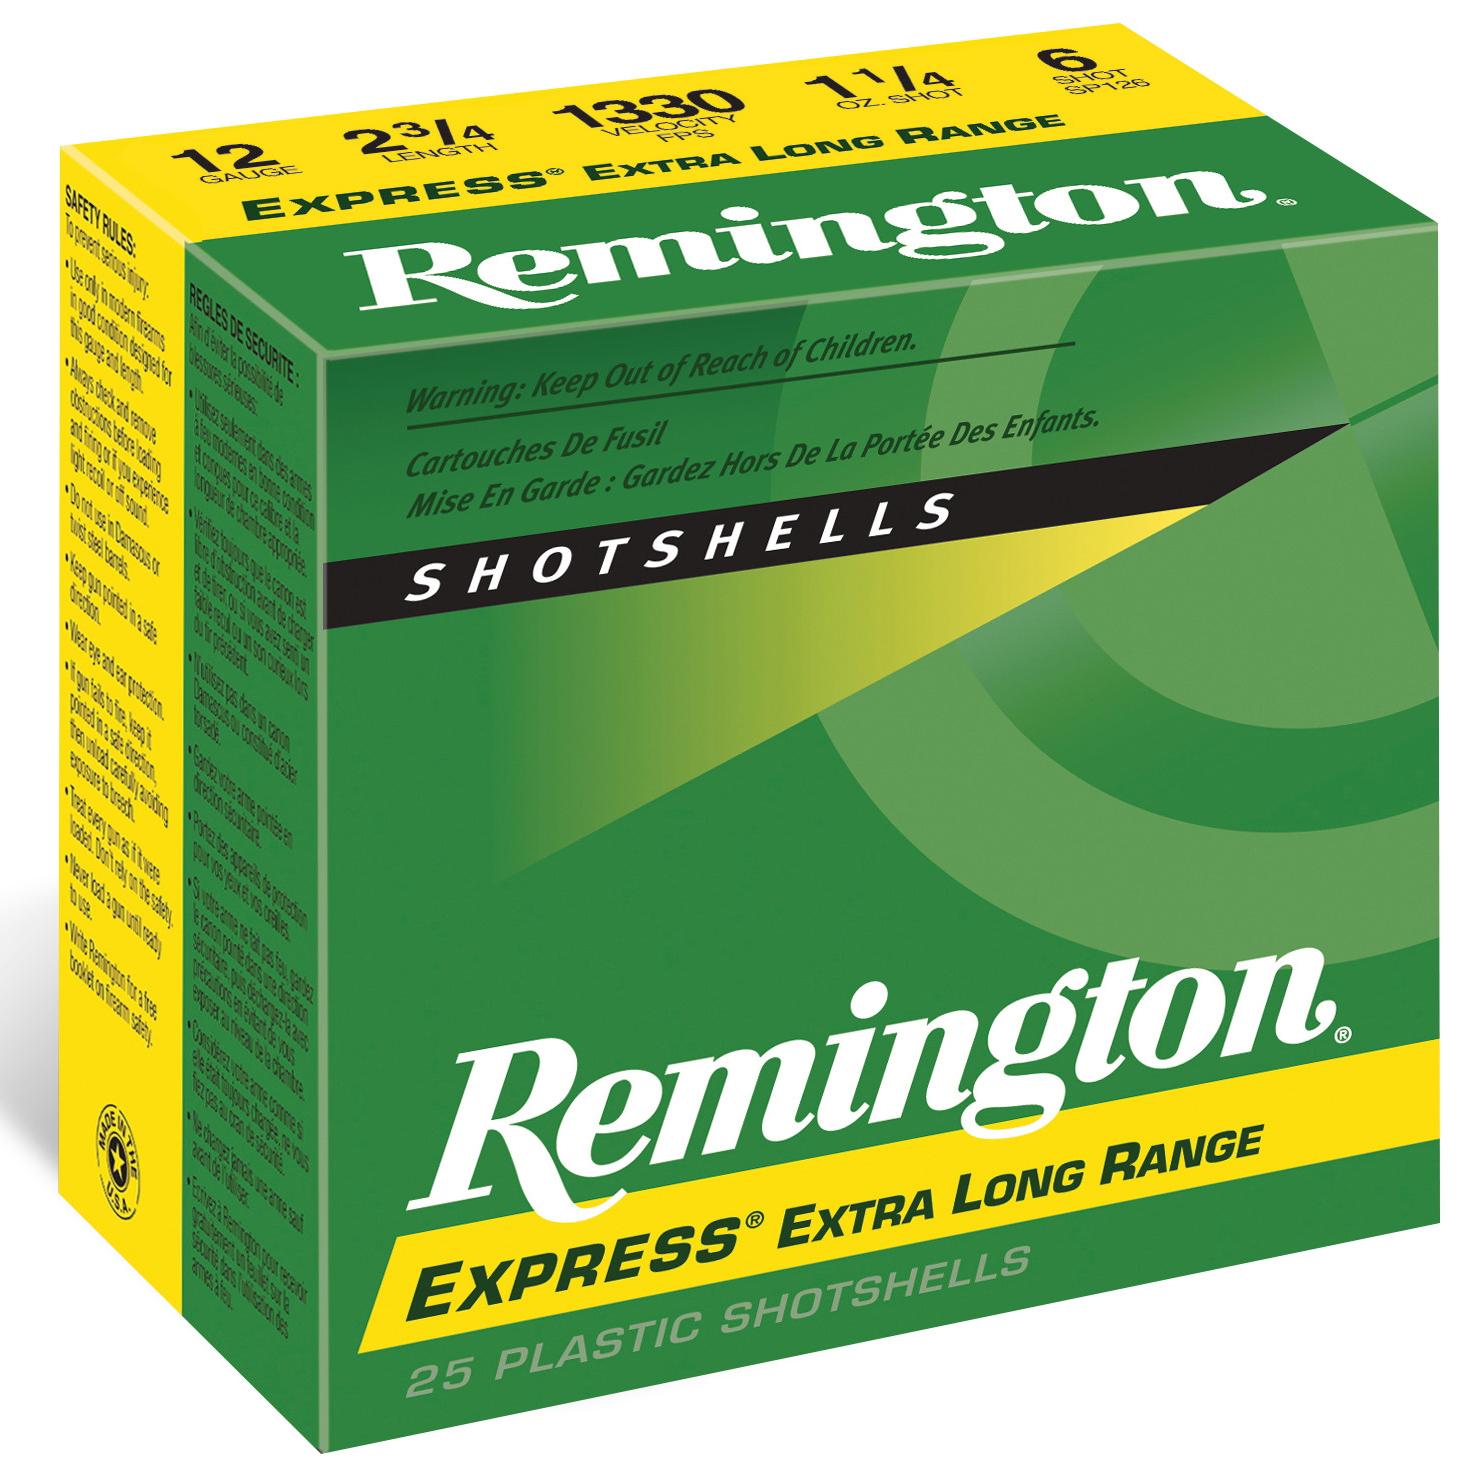 "Remington Express Long Range Shotshells, 12 Ga., 2-3/4"", 1-1/4 oz., #7.5"